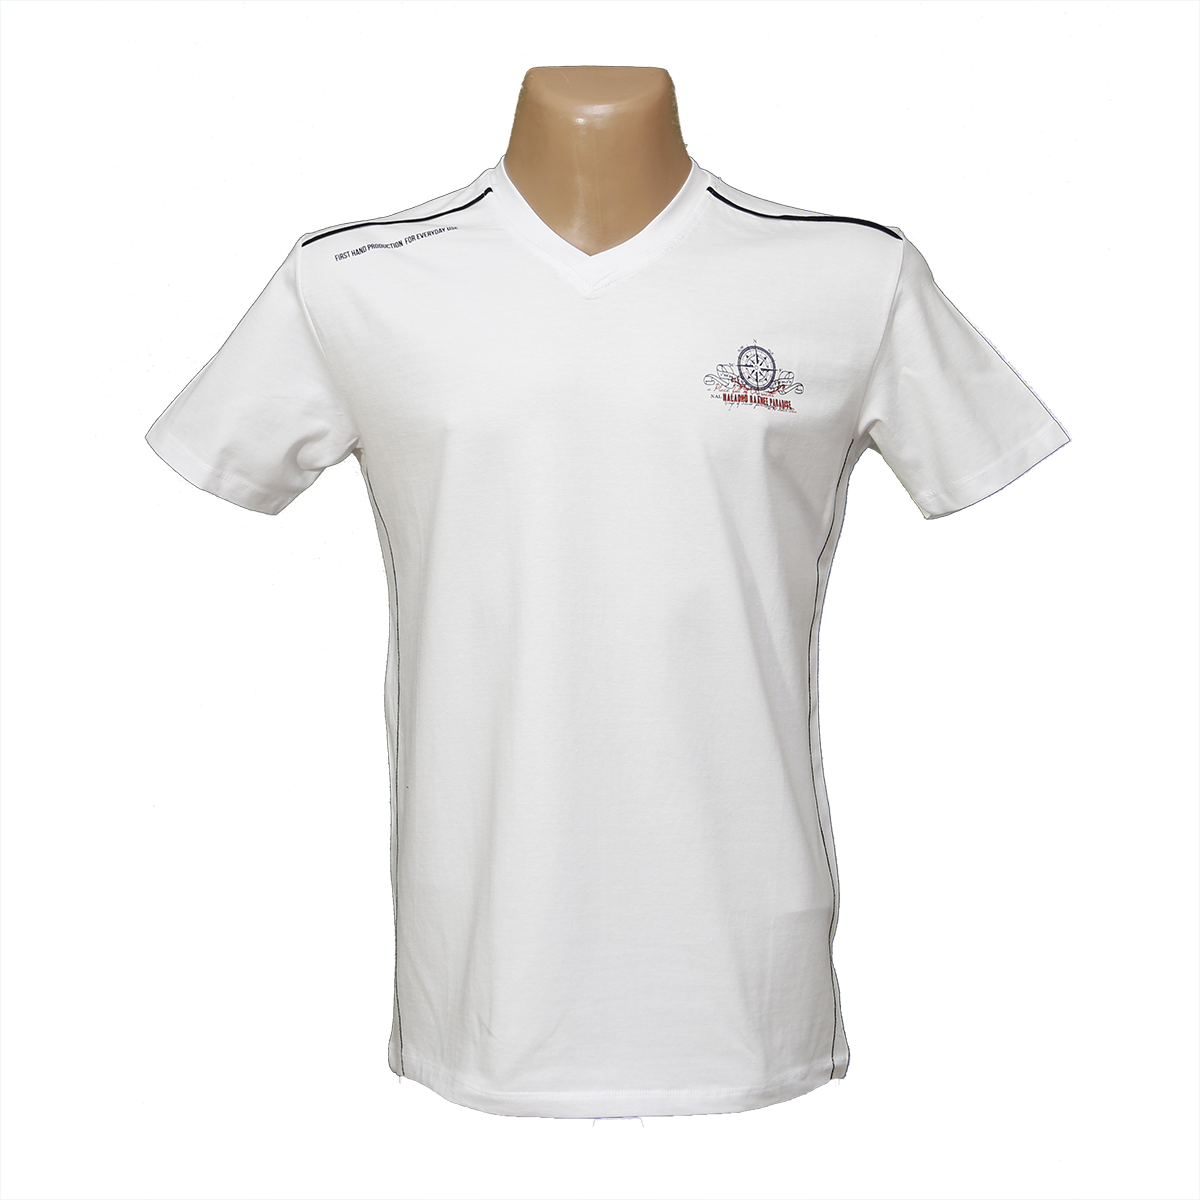 Мужская стрейчевая футболка Lycra тм. BY Walker. пр-во Турция 4016-5